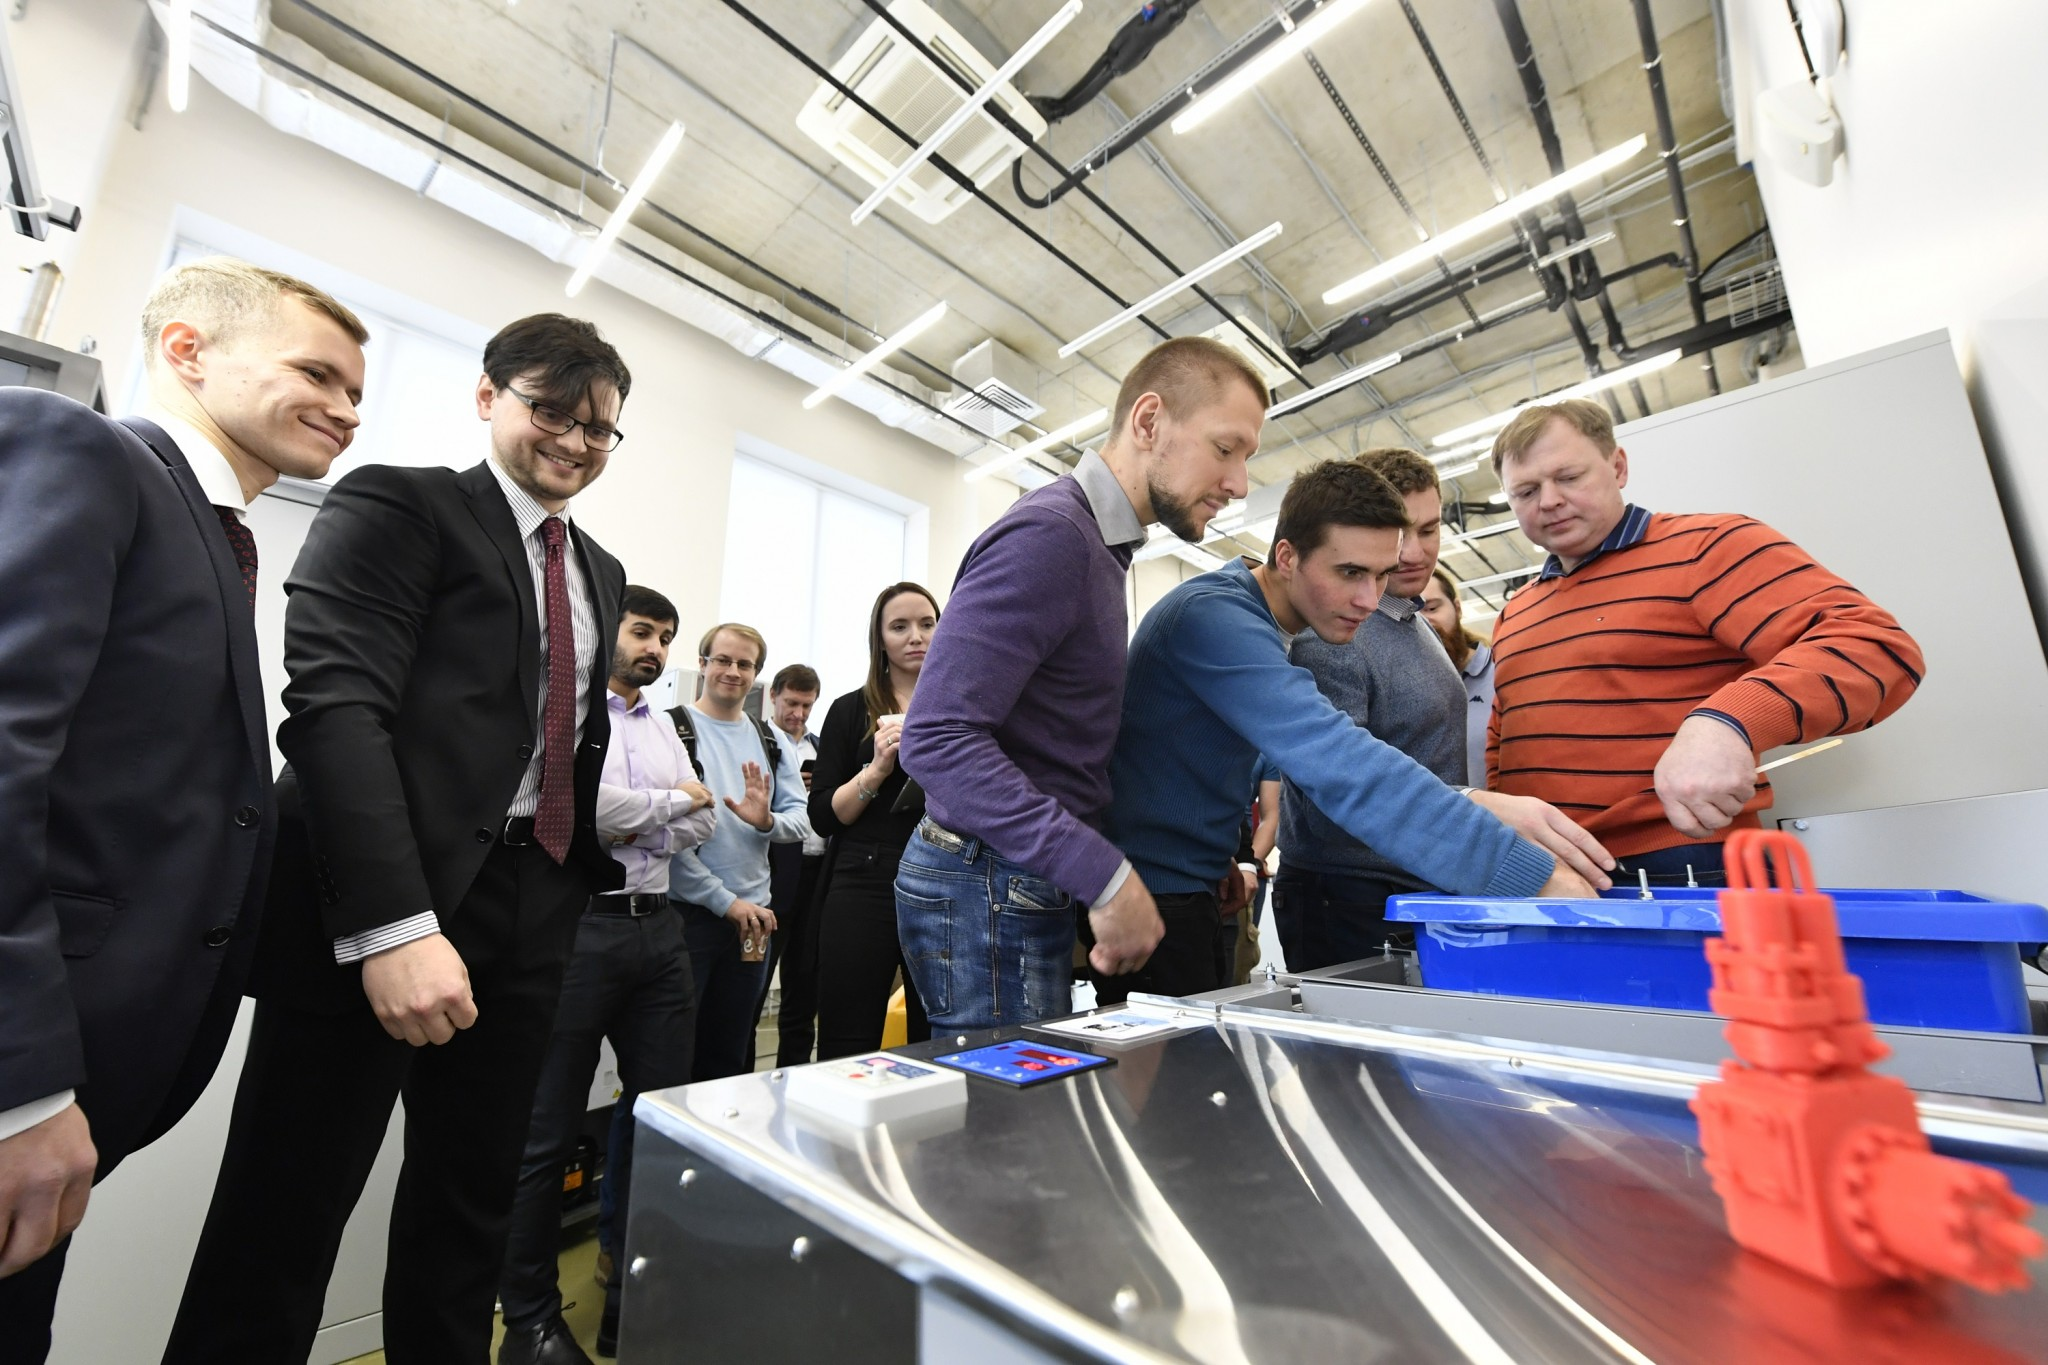 Guests examine the innovative refrigeration system. Photo: Skoltech.